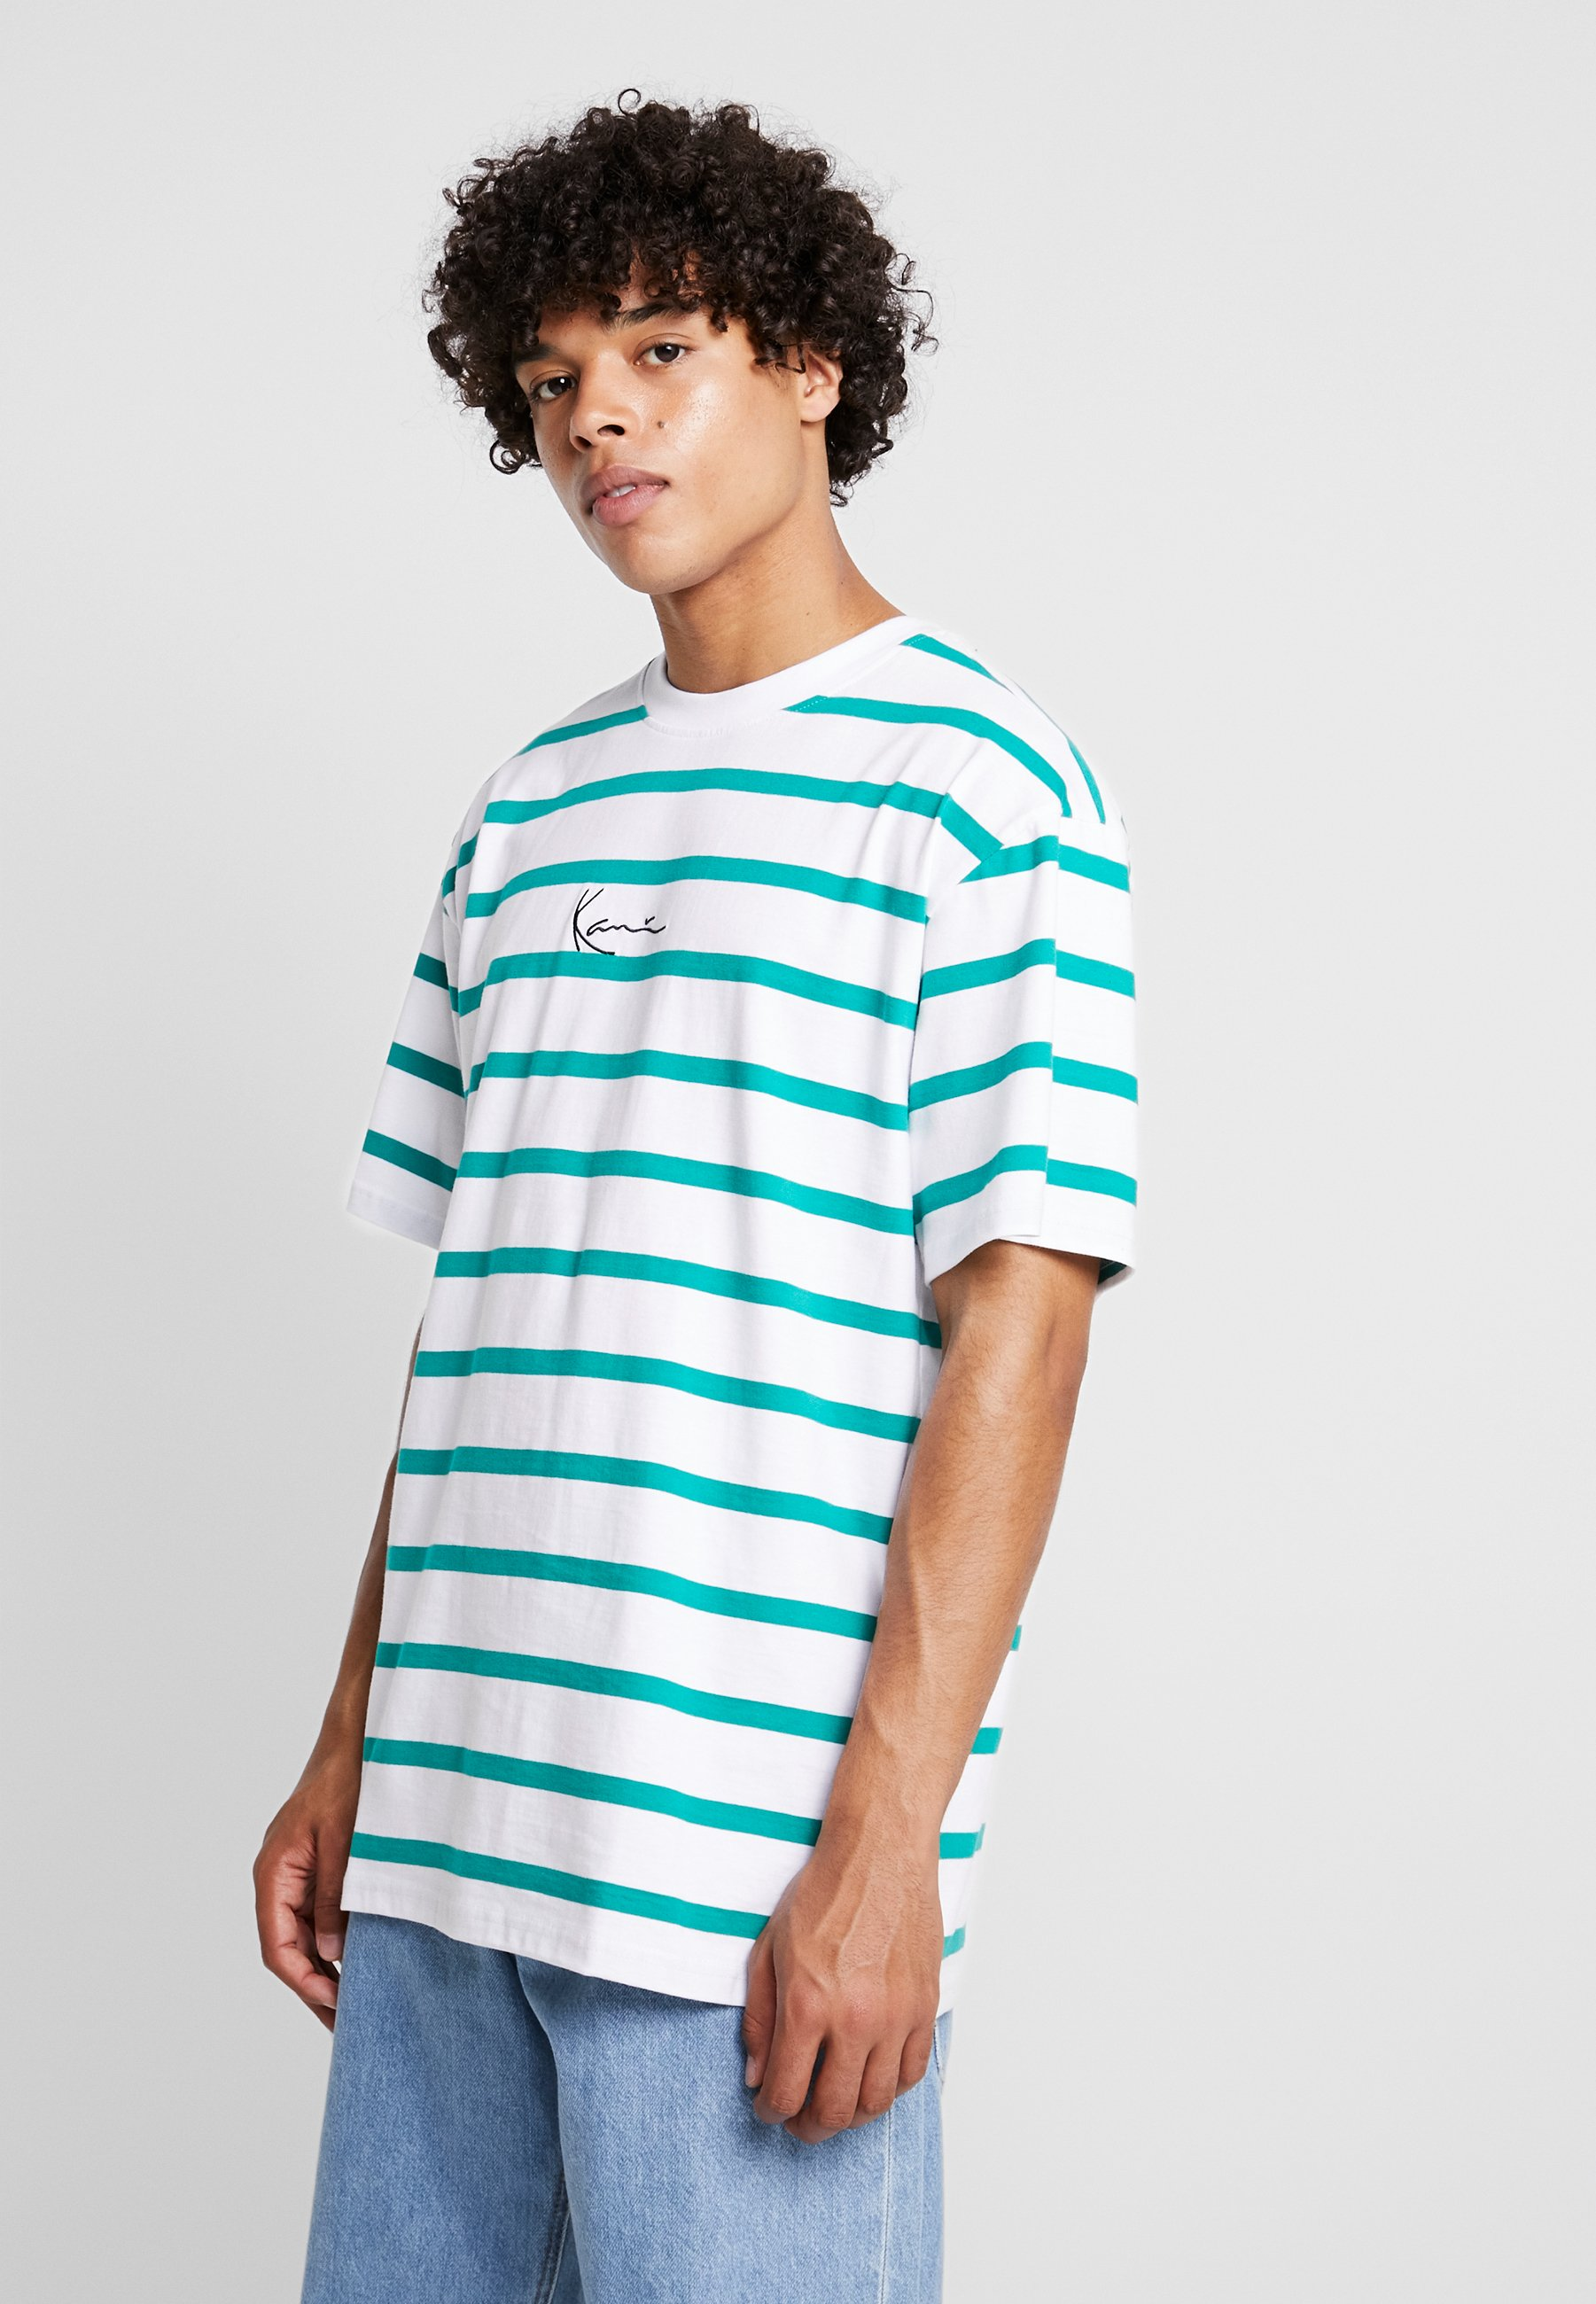 TeeT White green Karl shirt Stripe Imprimé Kani Signature K1JcTl35uF